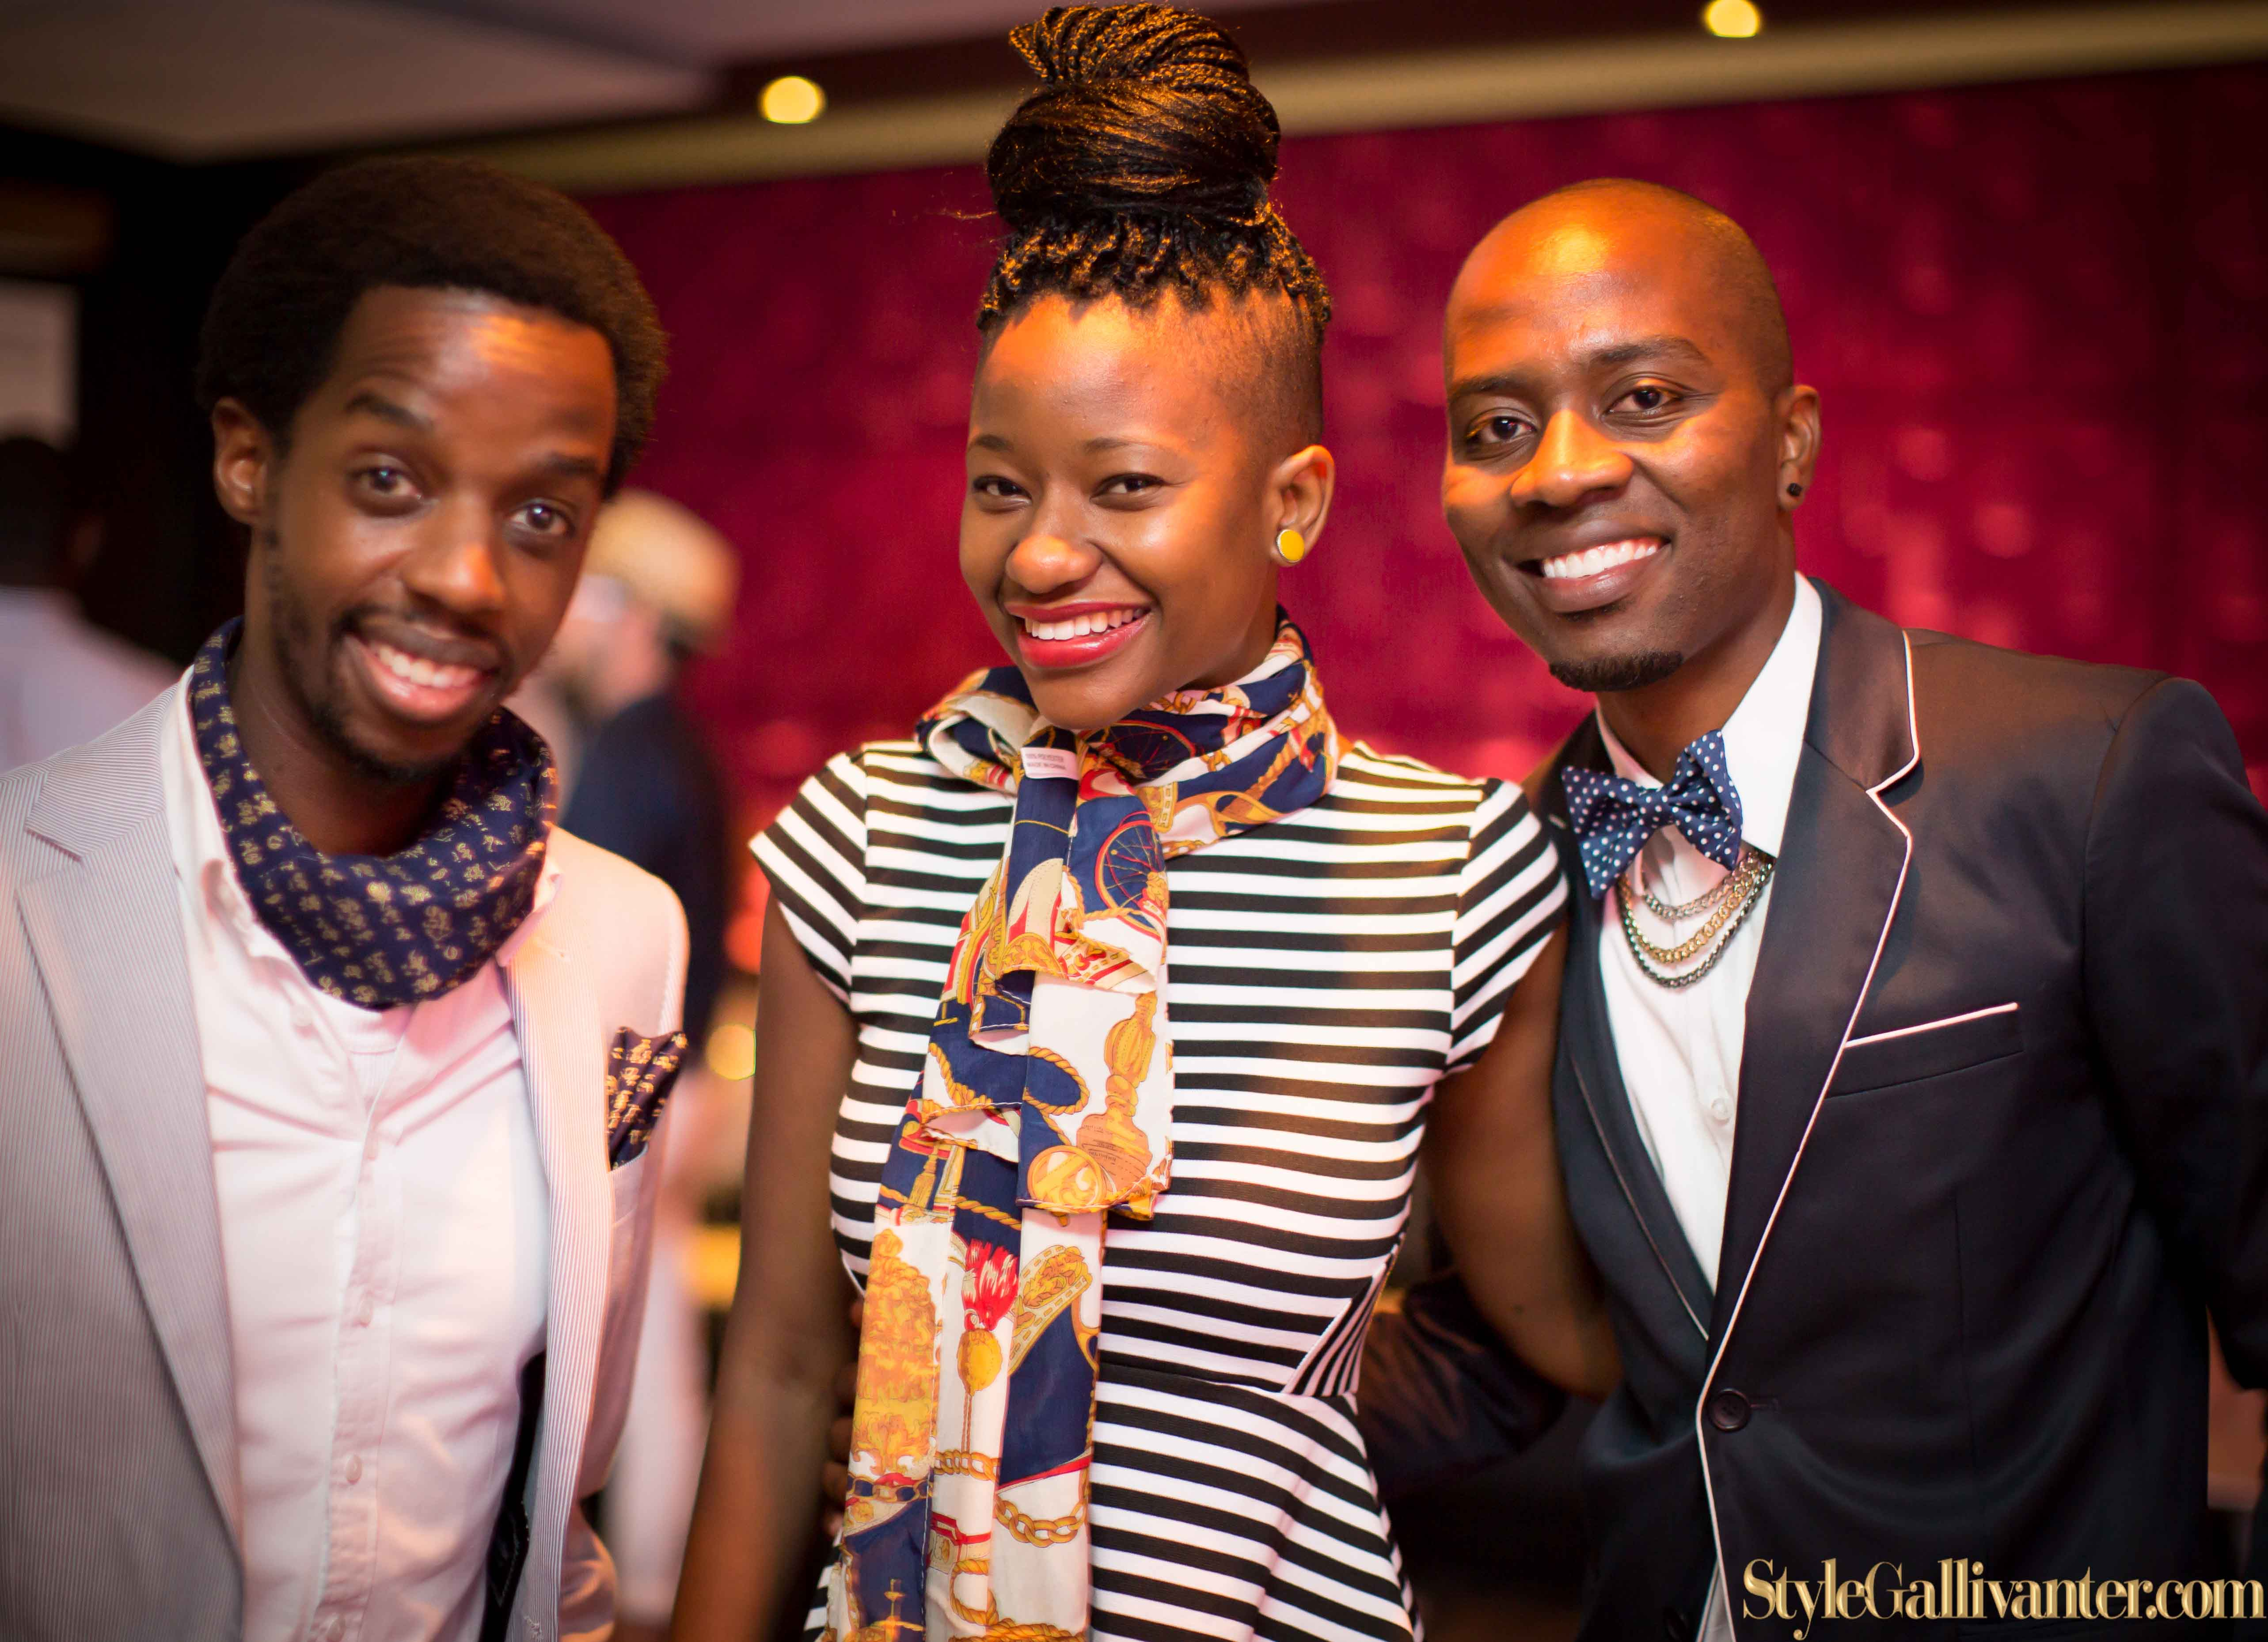 fashion-events-melbourne-2014_niche-on-bridge-restaurant_niche-function-room-richmond_best-venues-melbourne_high-fashion-venues-melbourne_melbourne's-best-fashion-bloggers-2014-5